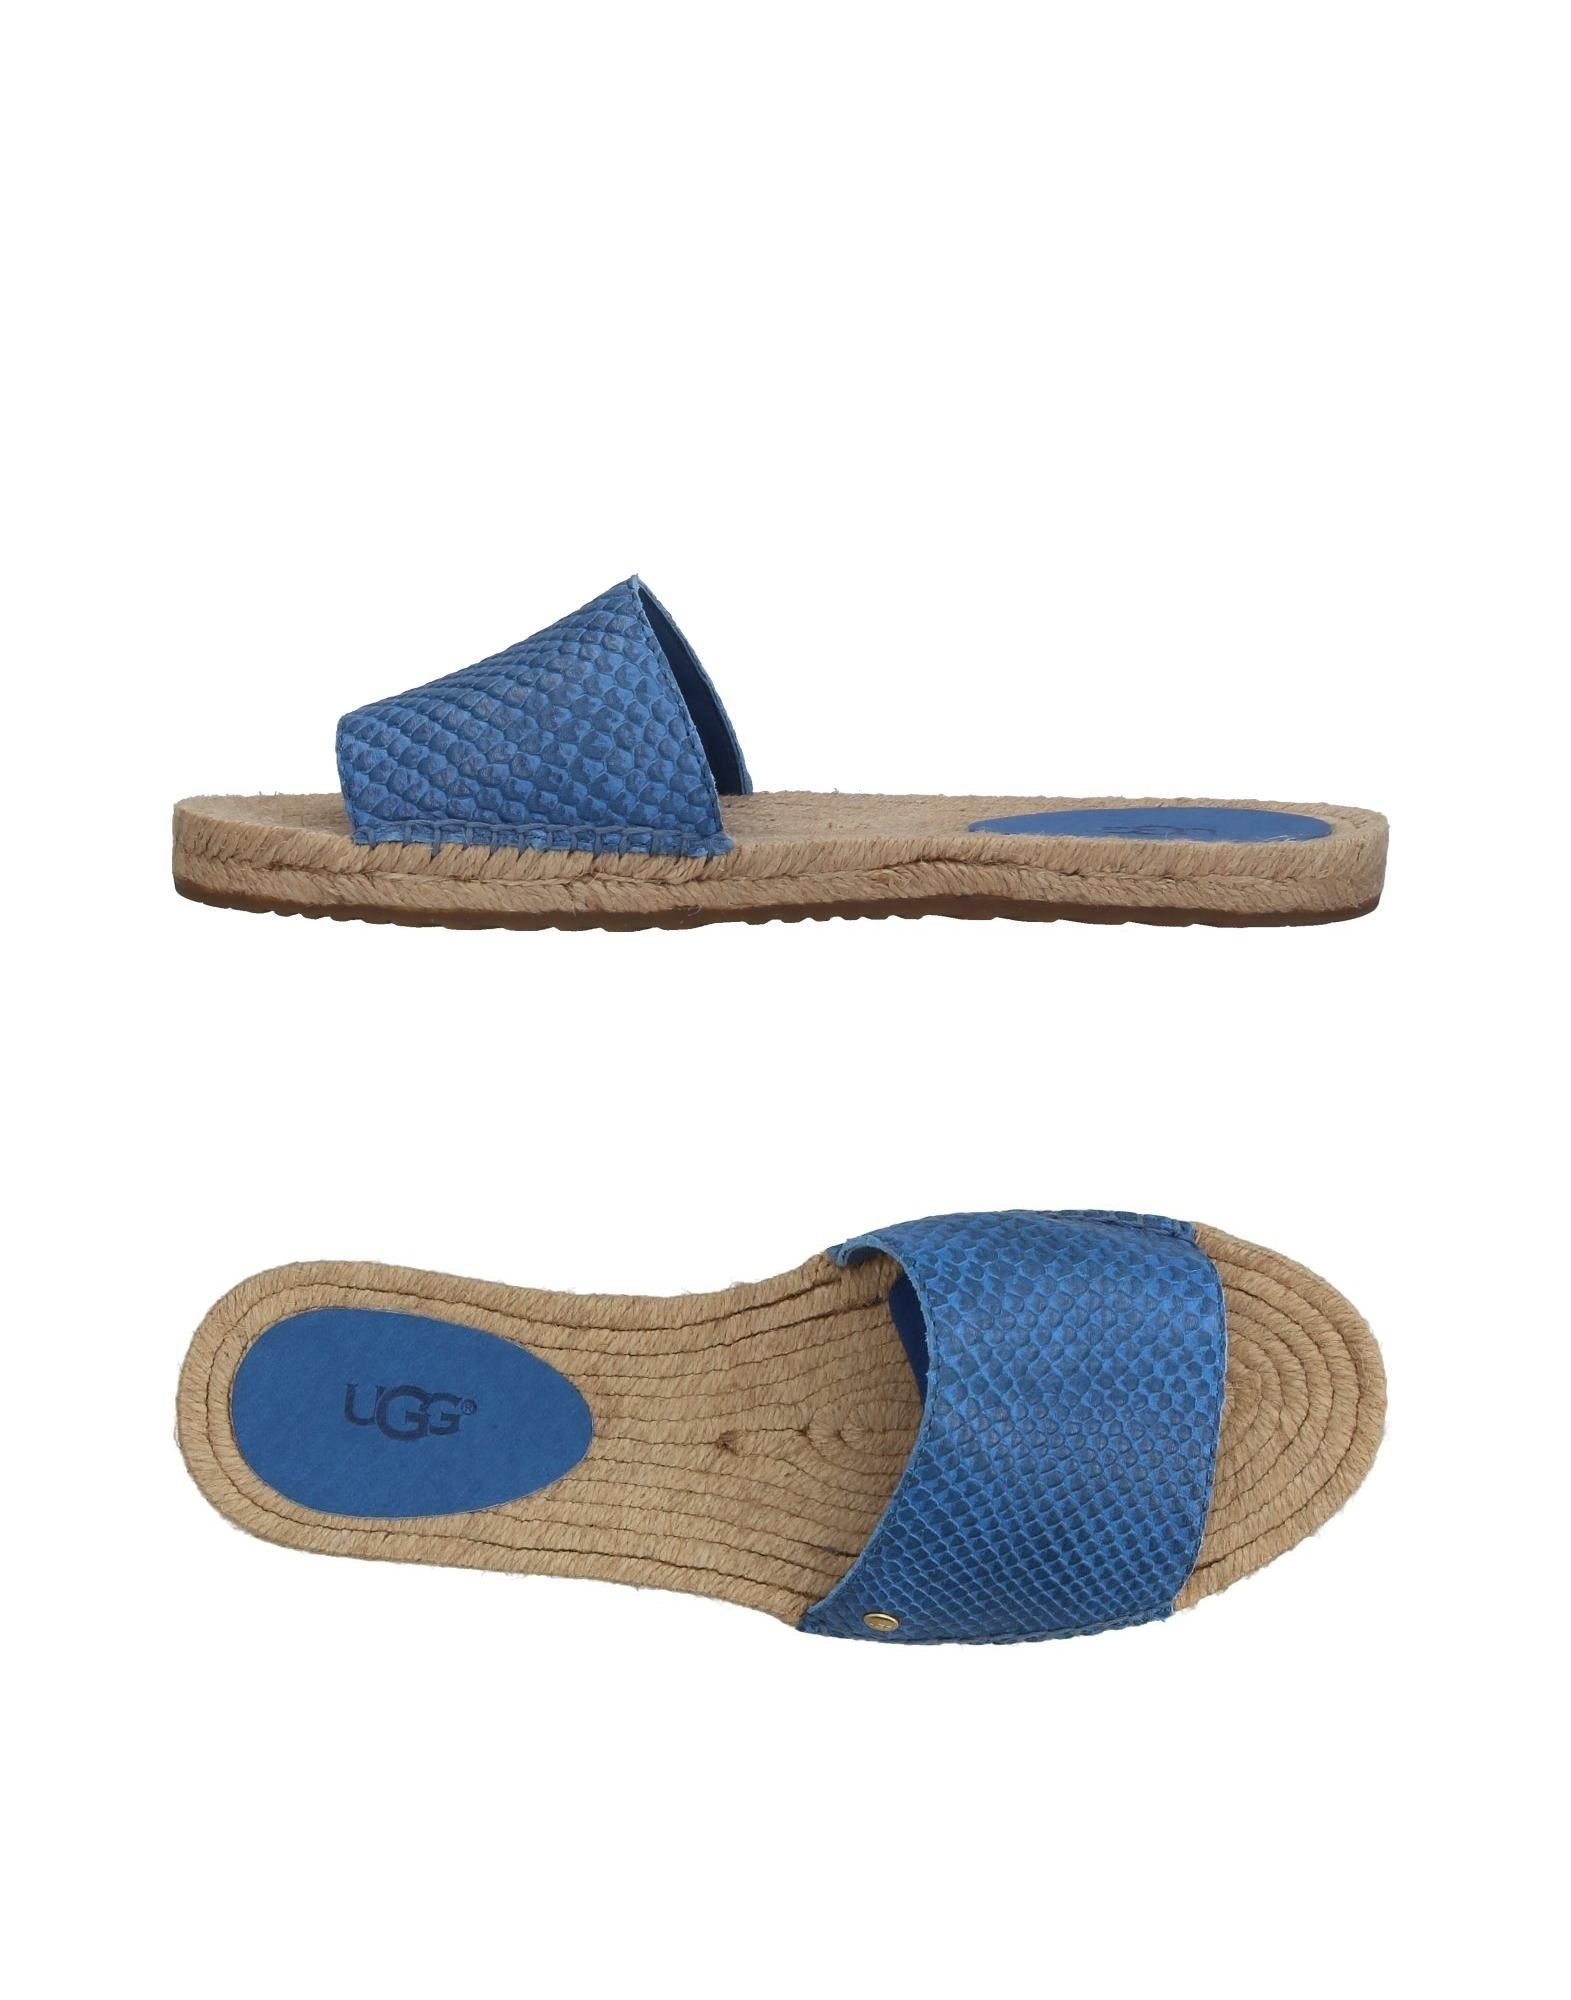 UGG AUSTRALIA Сандалии мужская обувь